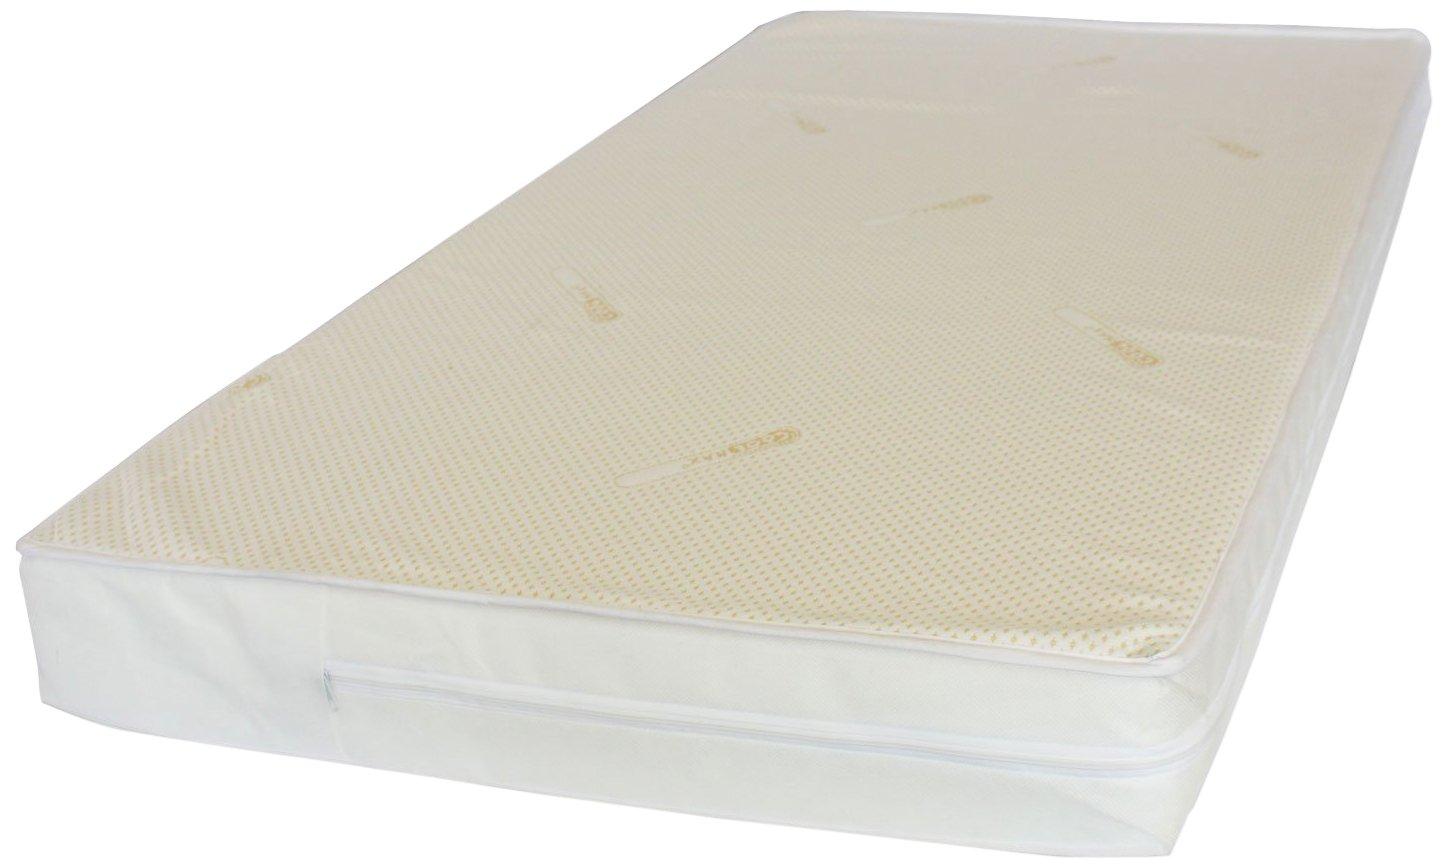 126 x 63 x 10 (Size 300) NightyNite® Superstart Sprung Cot Mattress, luxury Microfibre Cover, Waterproof Protection luxury Microfibre Cover SSCLC5